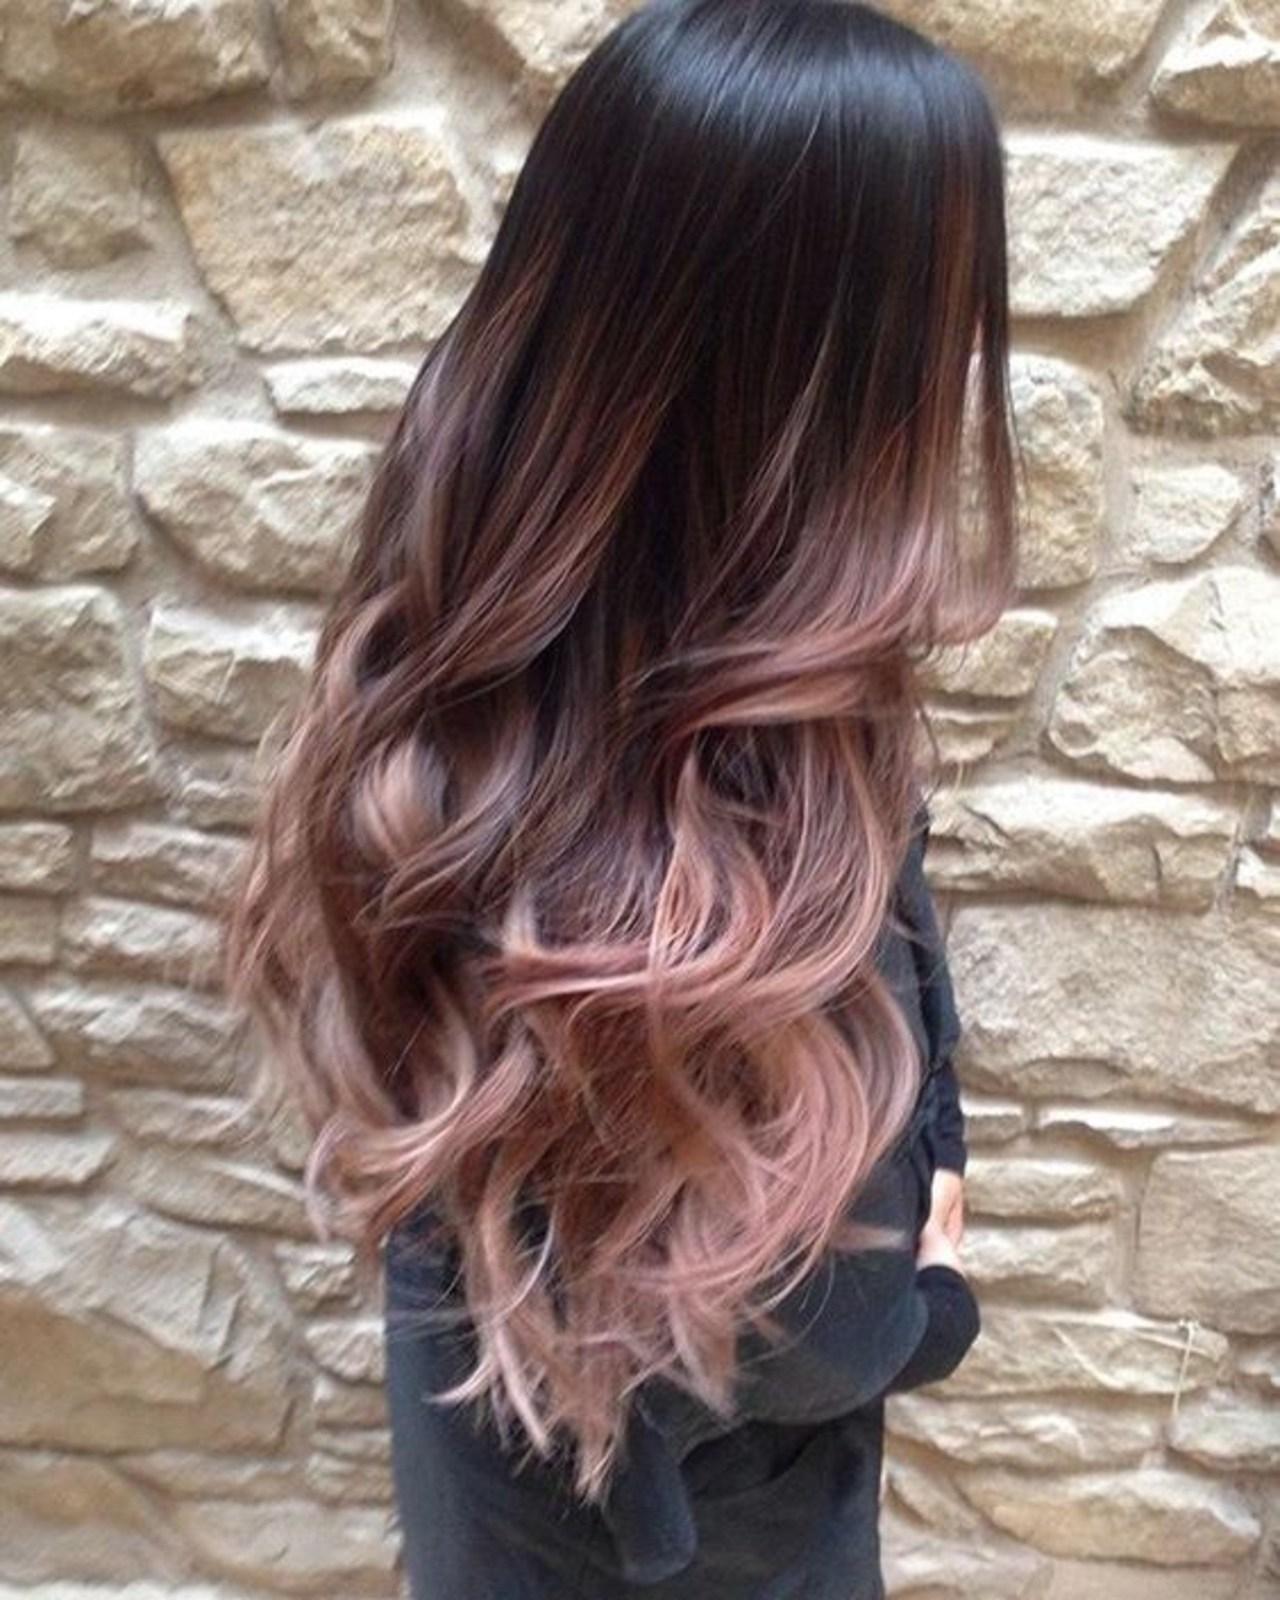 тенденции волос 2019 фото 9